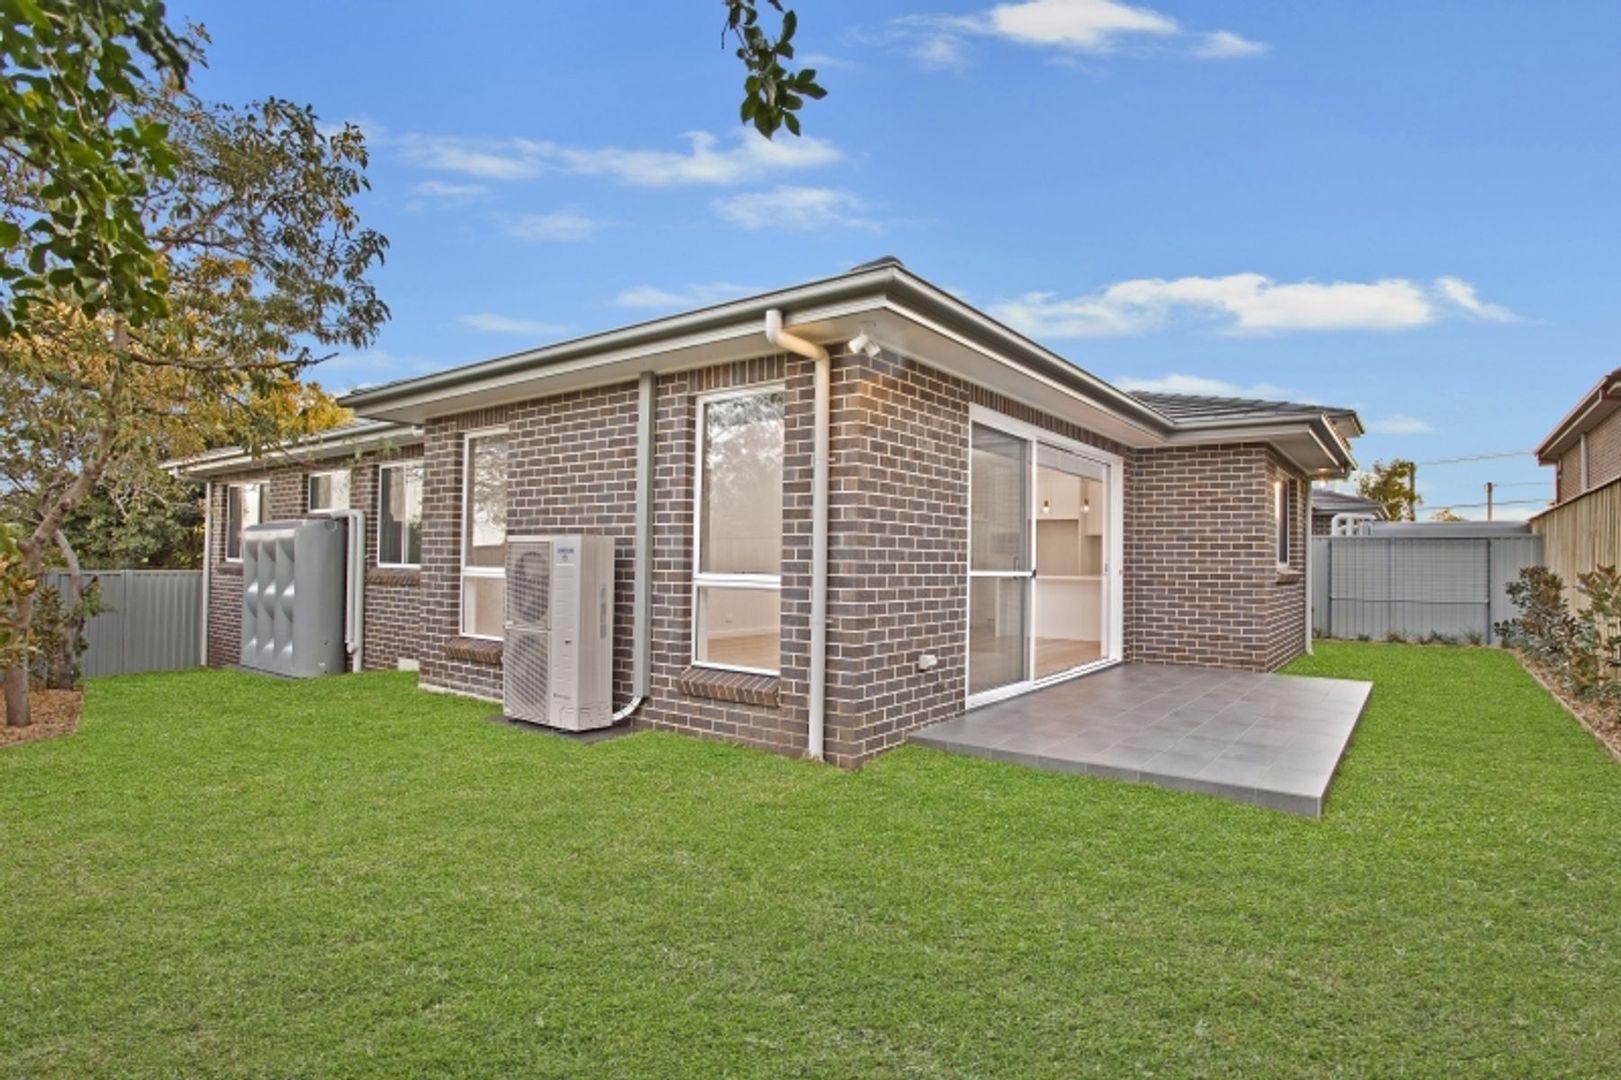 3/65 Marsden Road, West Ryde NSW 2114, Image 0